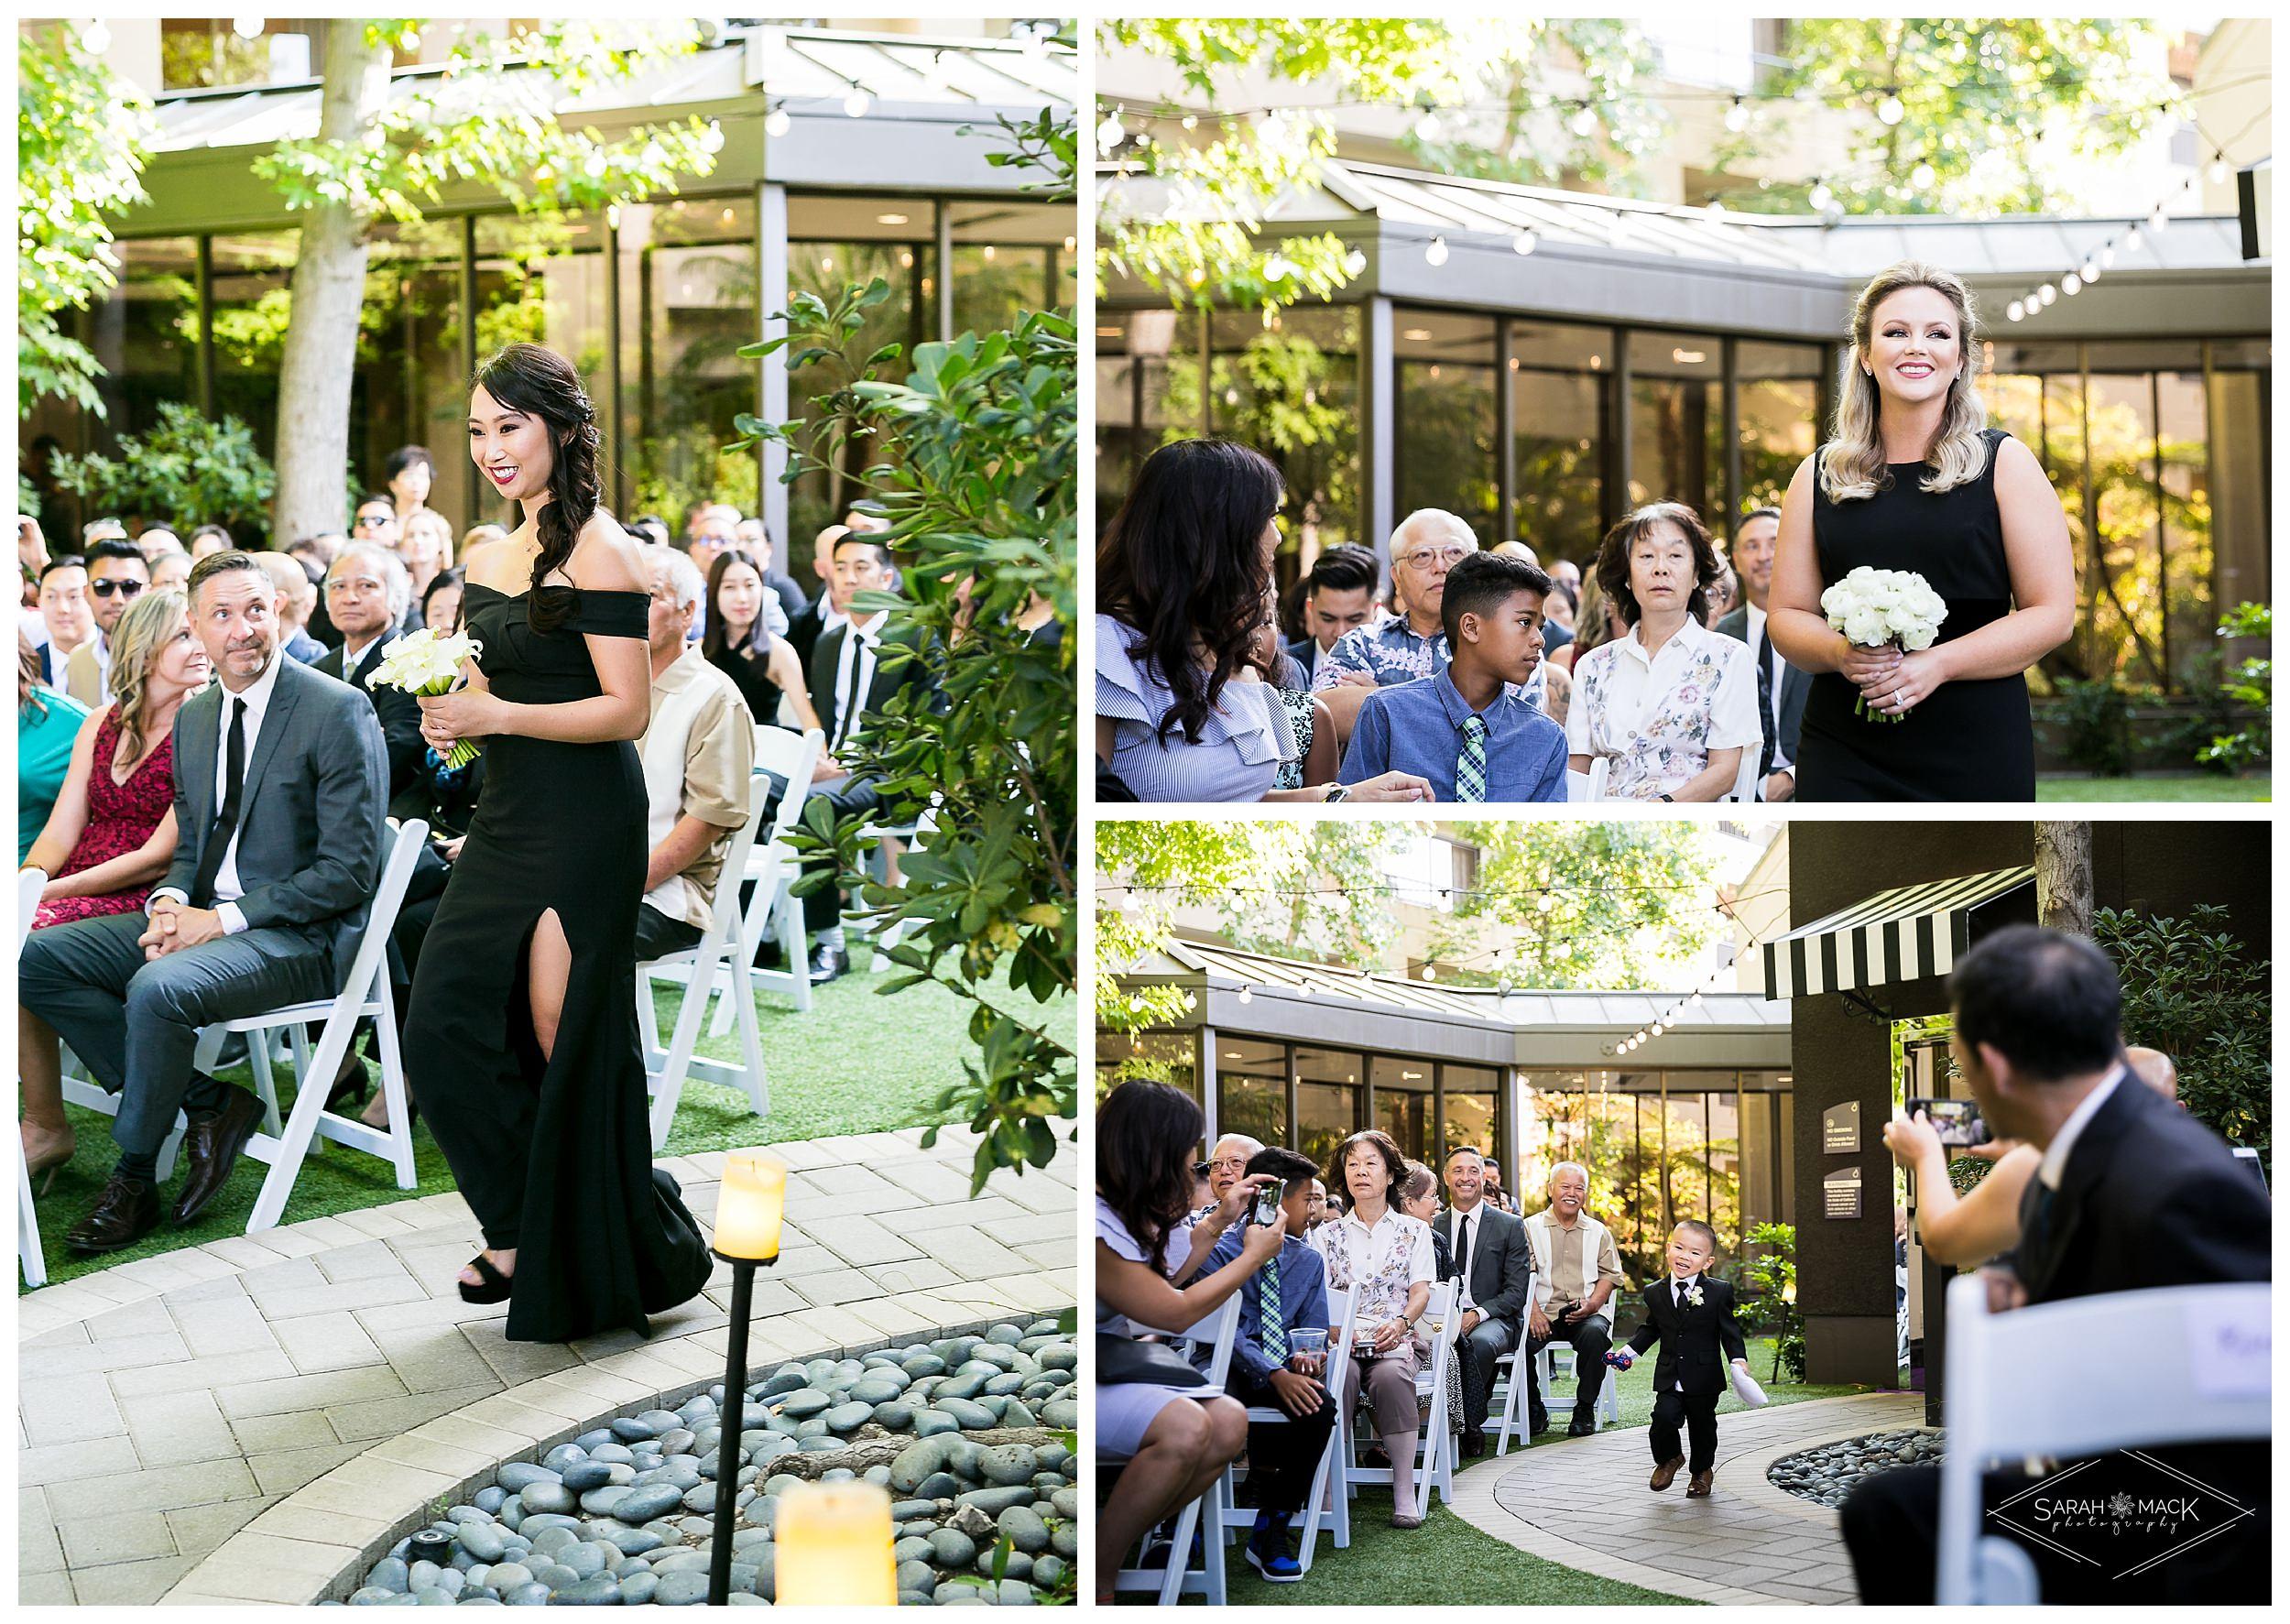 LE-Avenue-of-the-Arts-Costa-Mesa-Wedding-Photography-0135.jpg